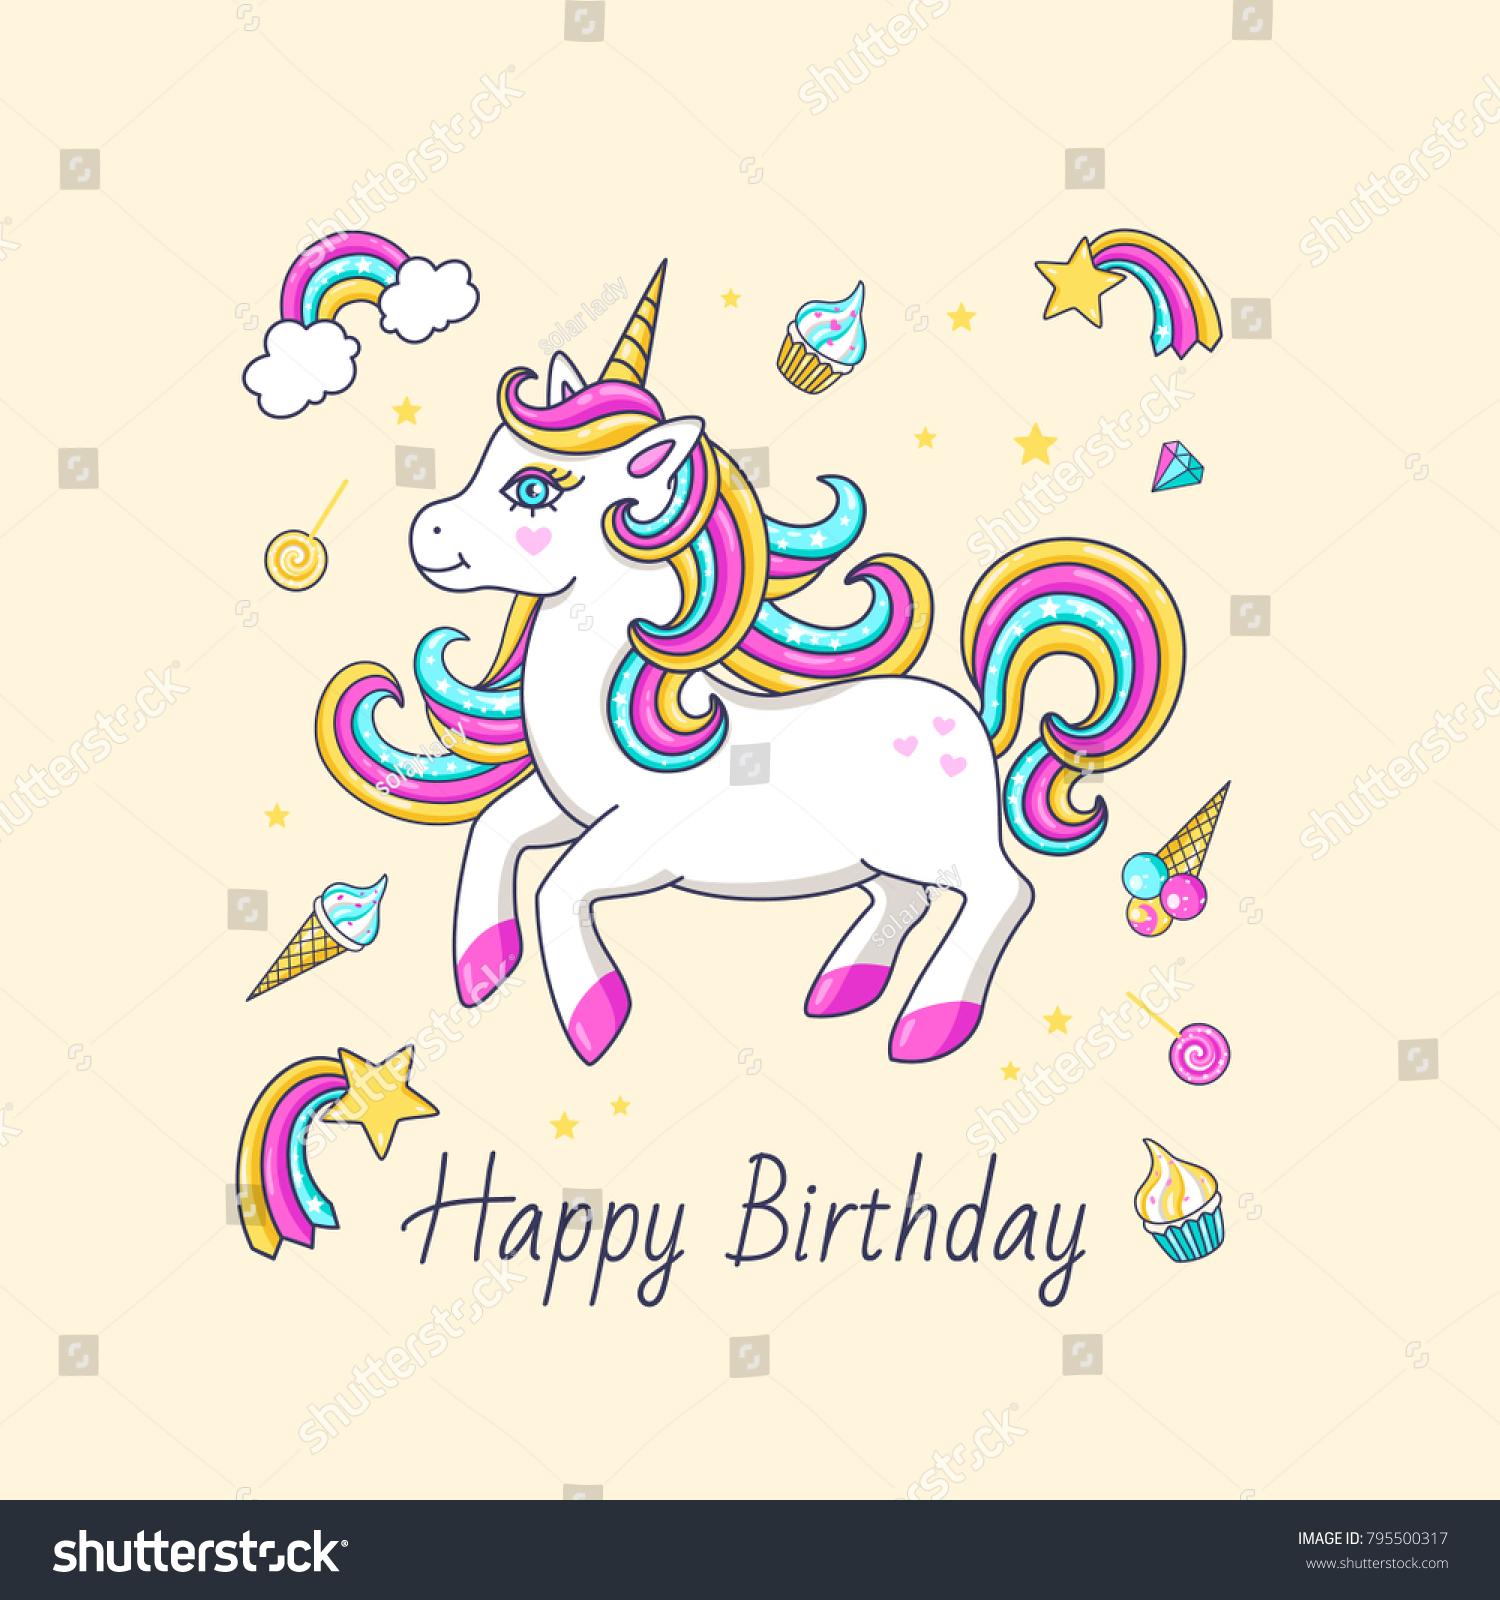 Happy Birthday Card With Cute Unicorn Vector Illustration